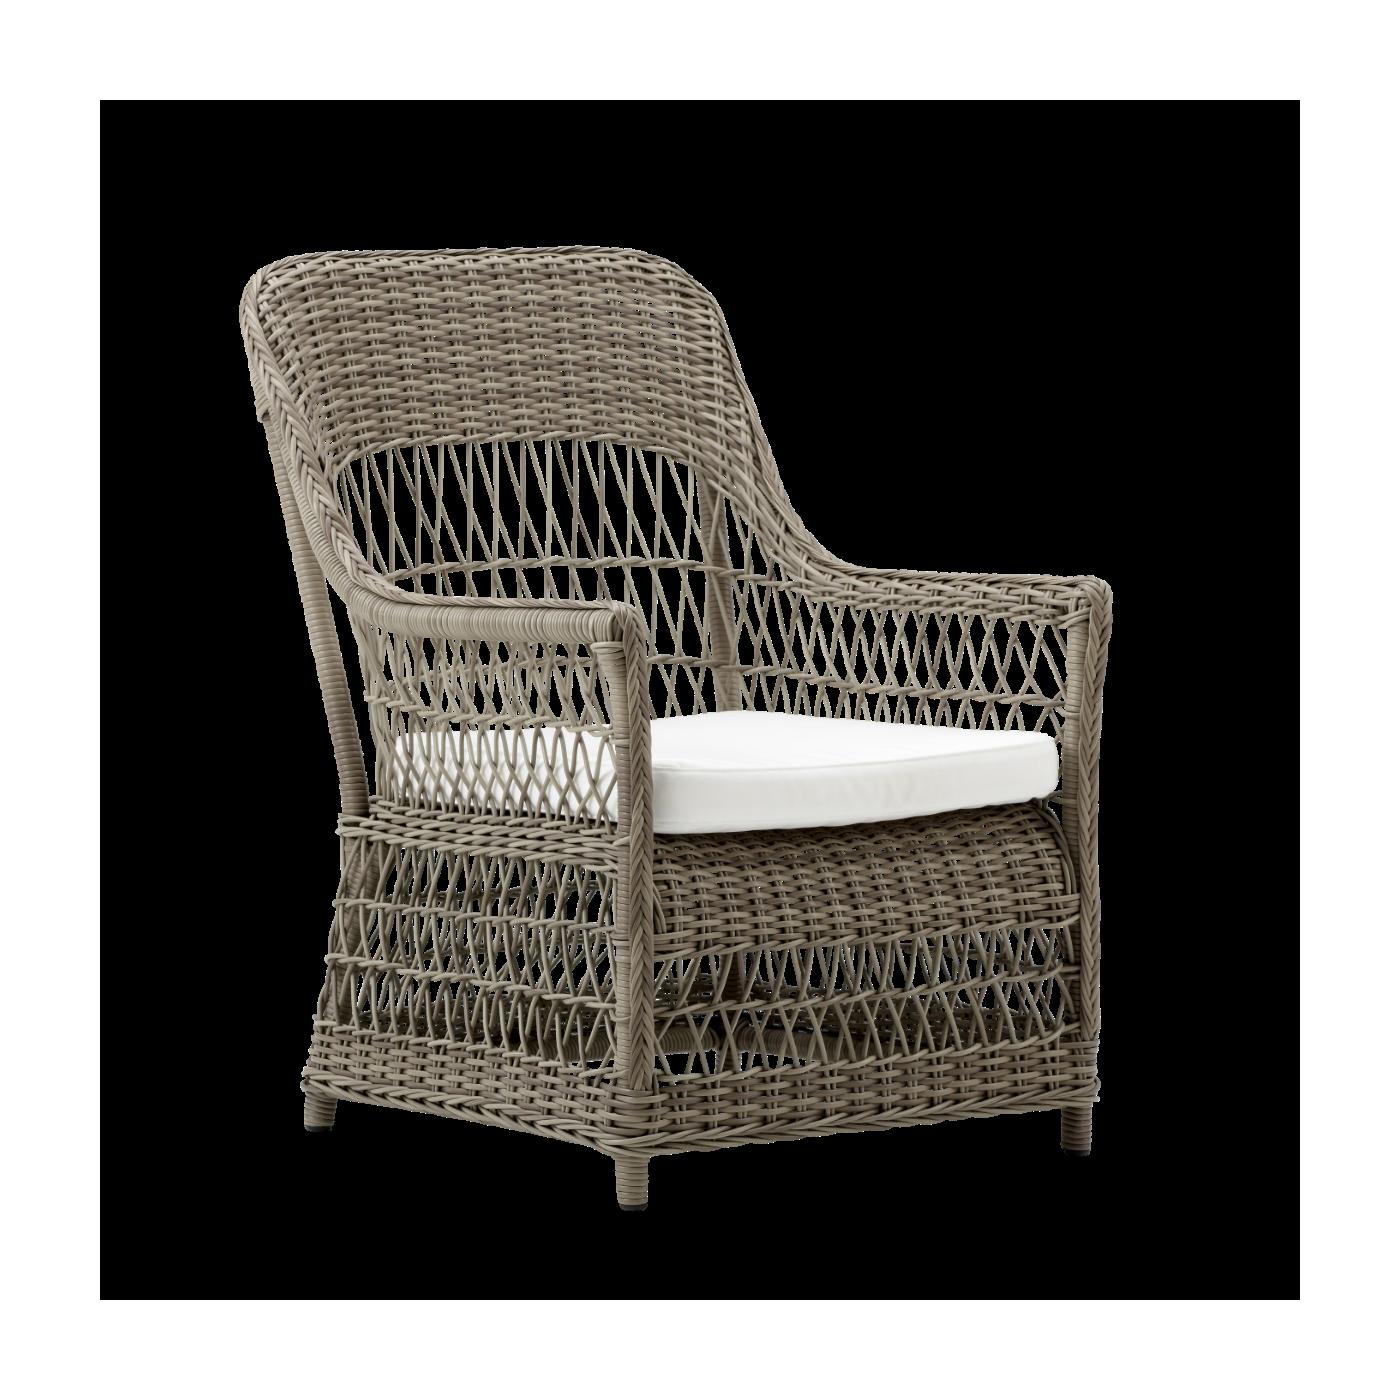 Fåtölj Dawn lounge chair Antique, Sika-design